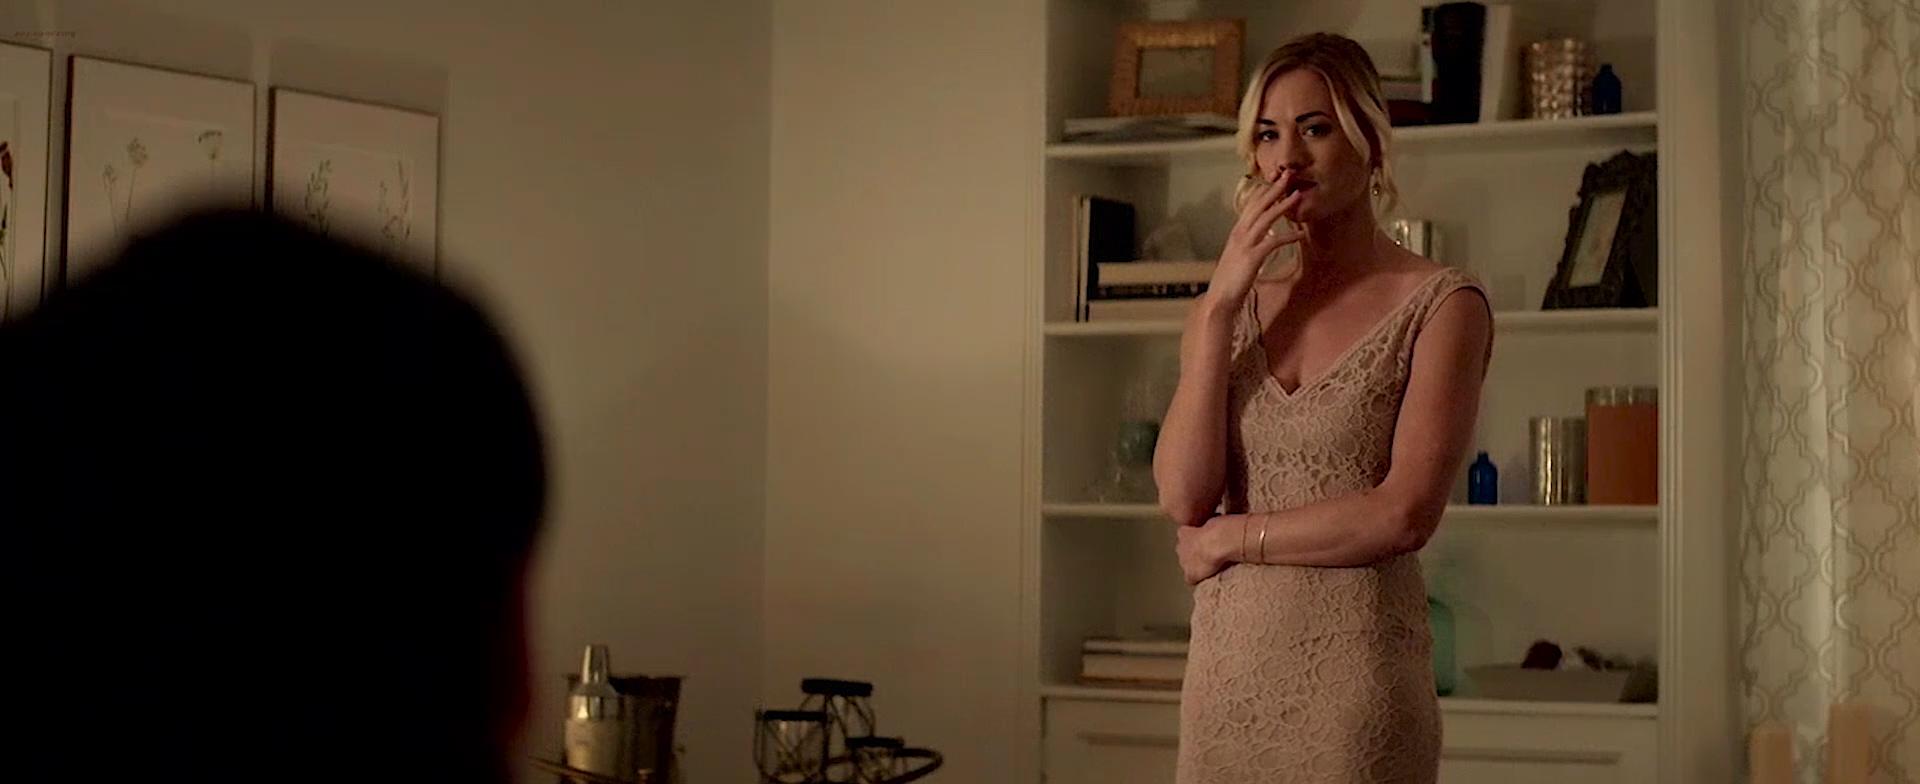 Yvonne strahovski boobs in chuck series scandalplanetcom 5